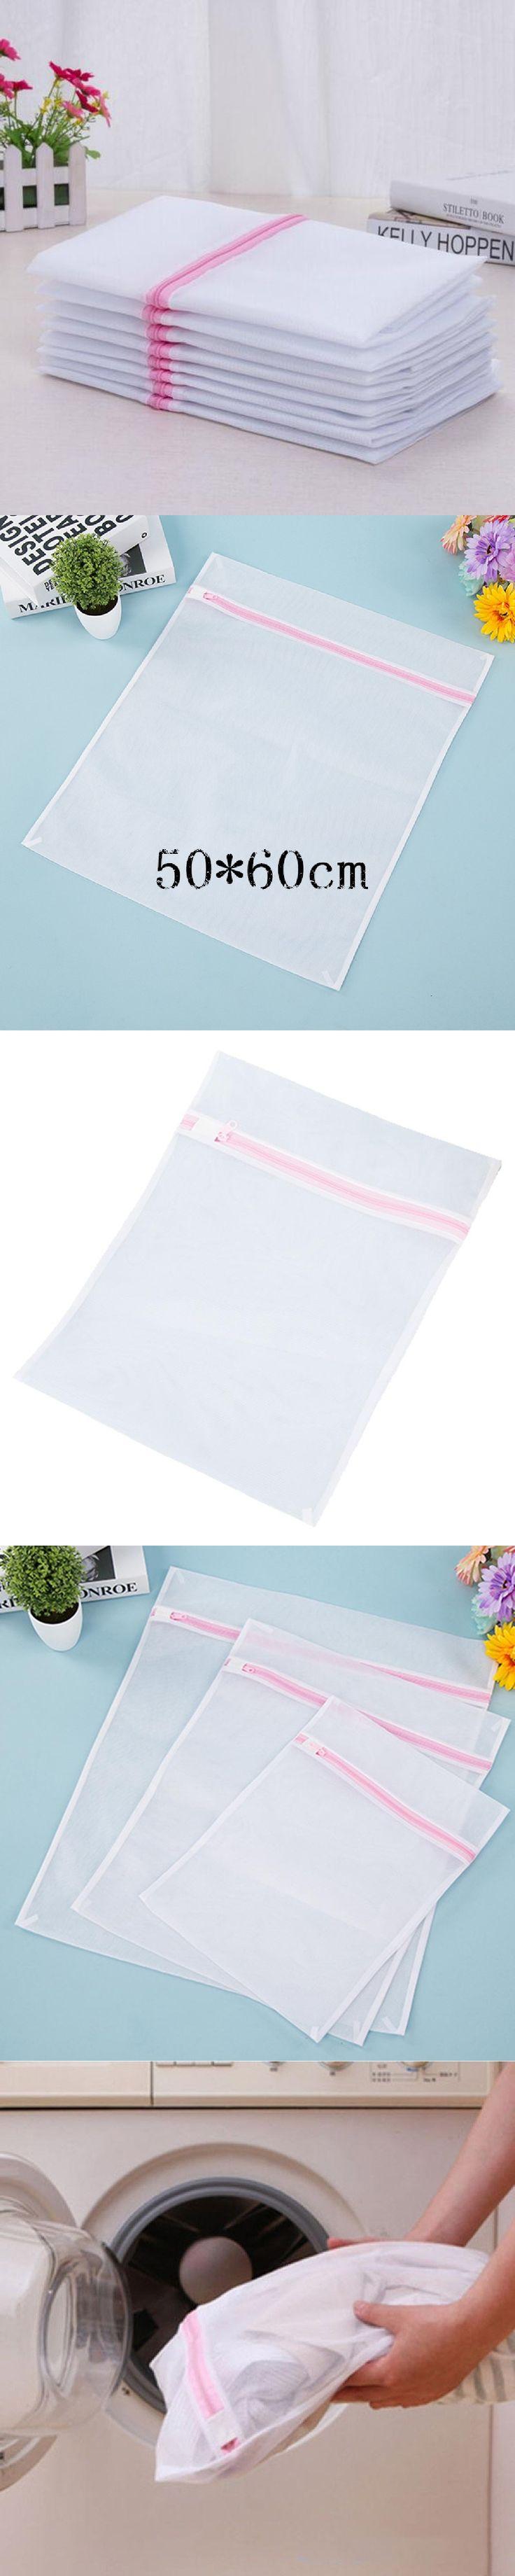 Laundry Wash Bags Foldable Delicates Lingerie Bra Socks Underwear Washing Machine Clothes Protection Net